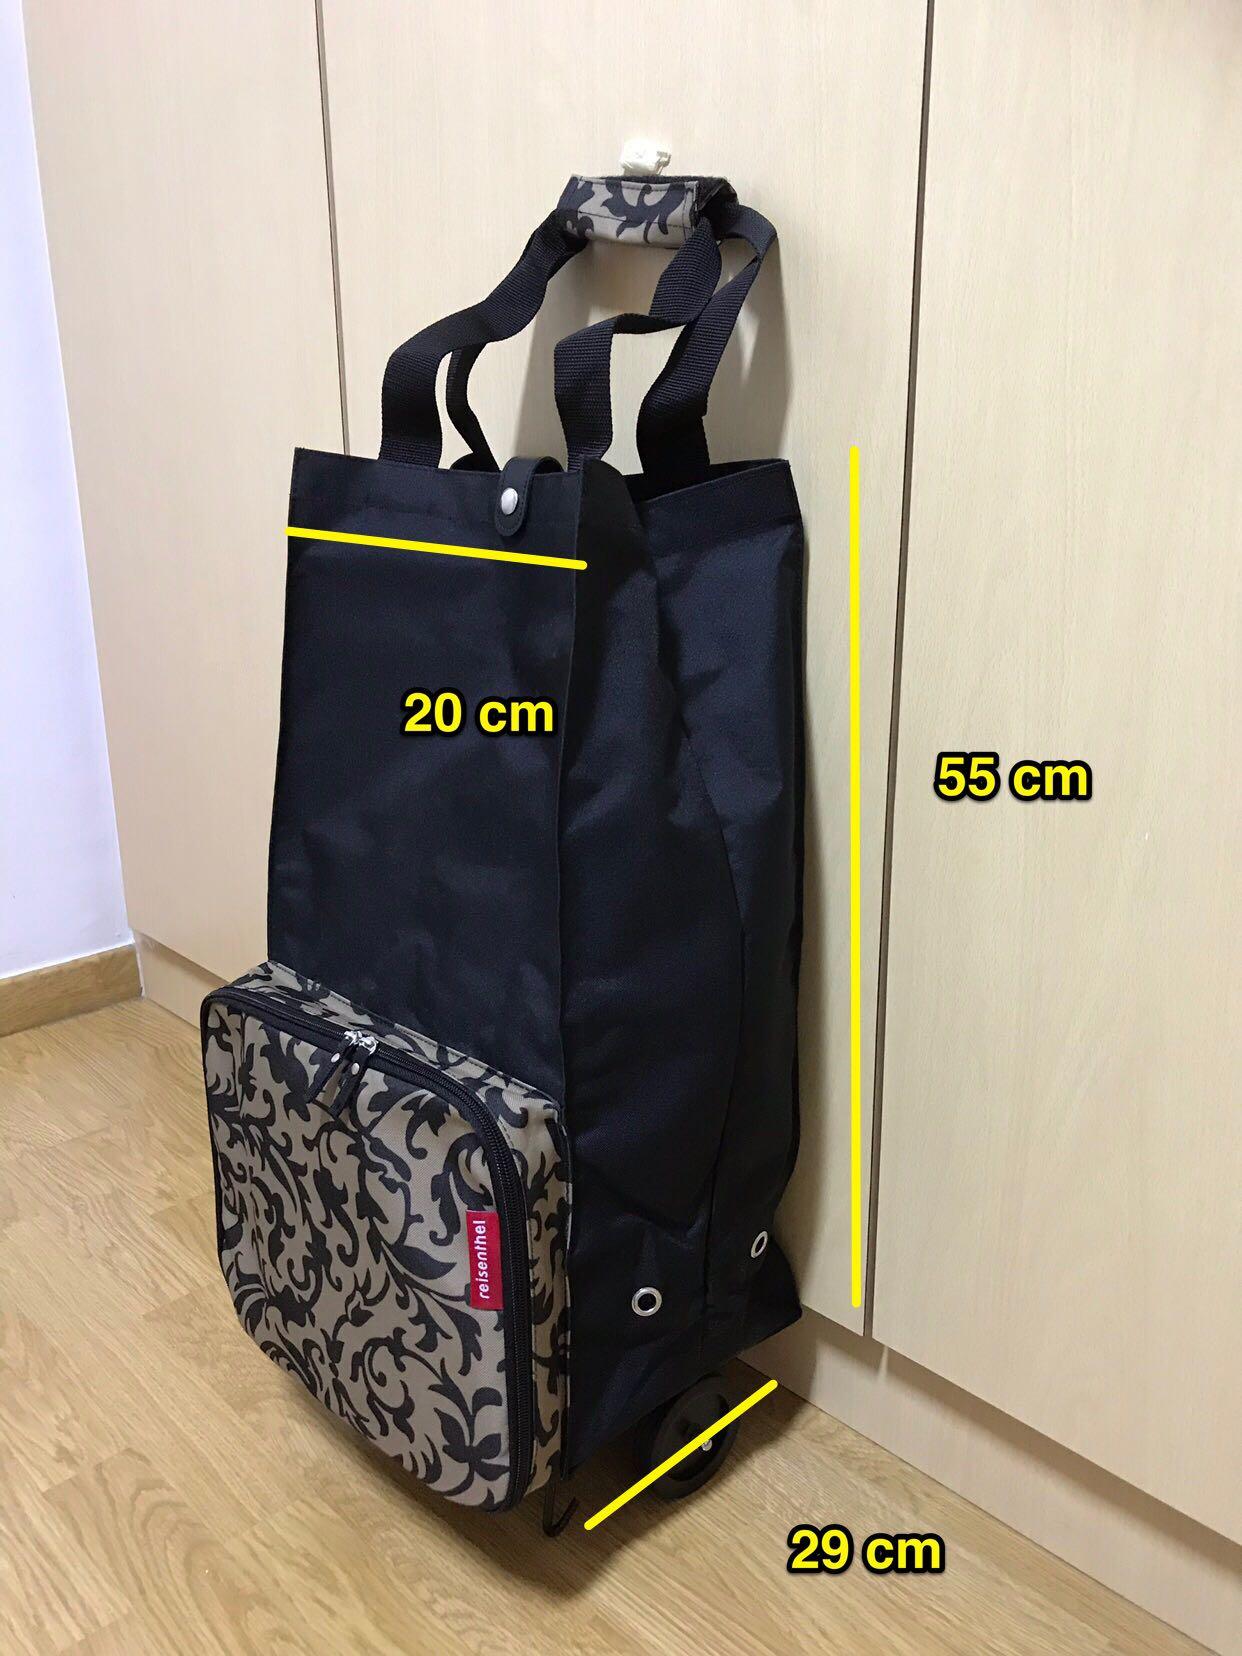 dc0c0c6d7 Foldable shopping trolley bag , Women's Fashion, Bags & Wallets, Handbags  on Carousell